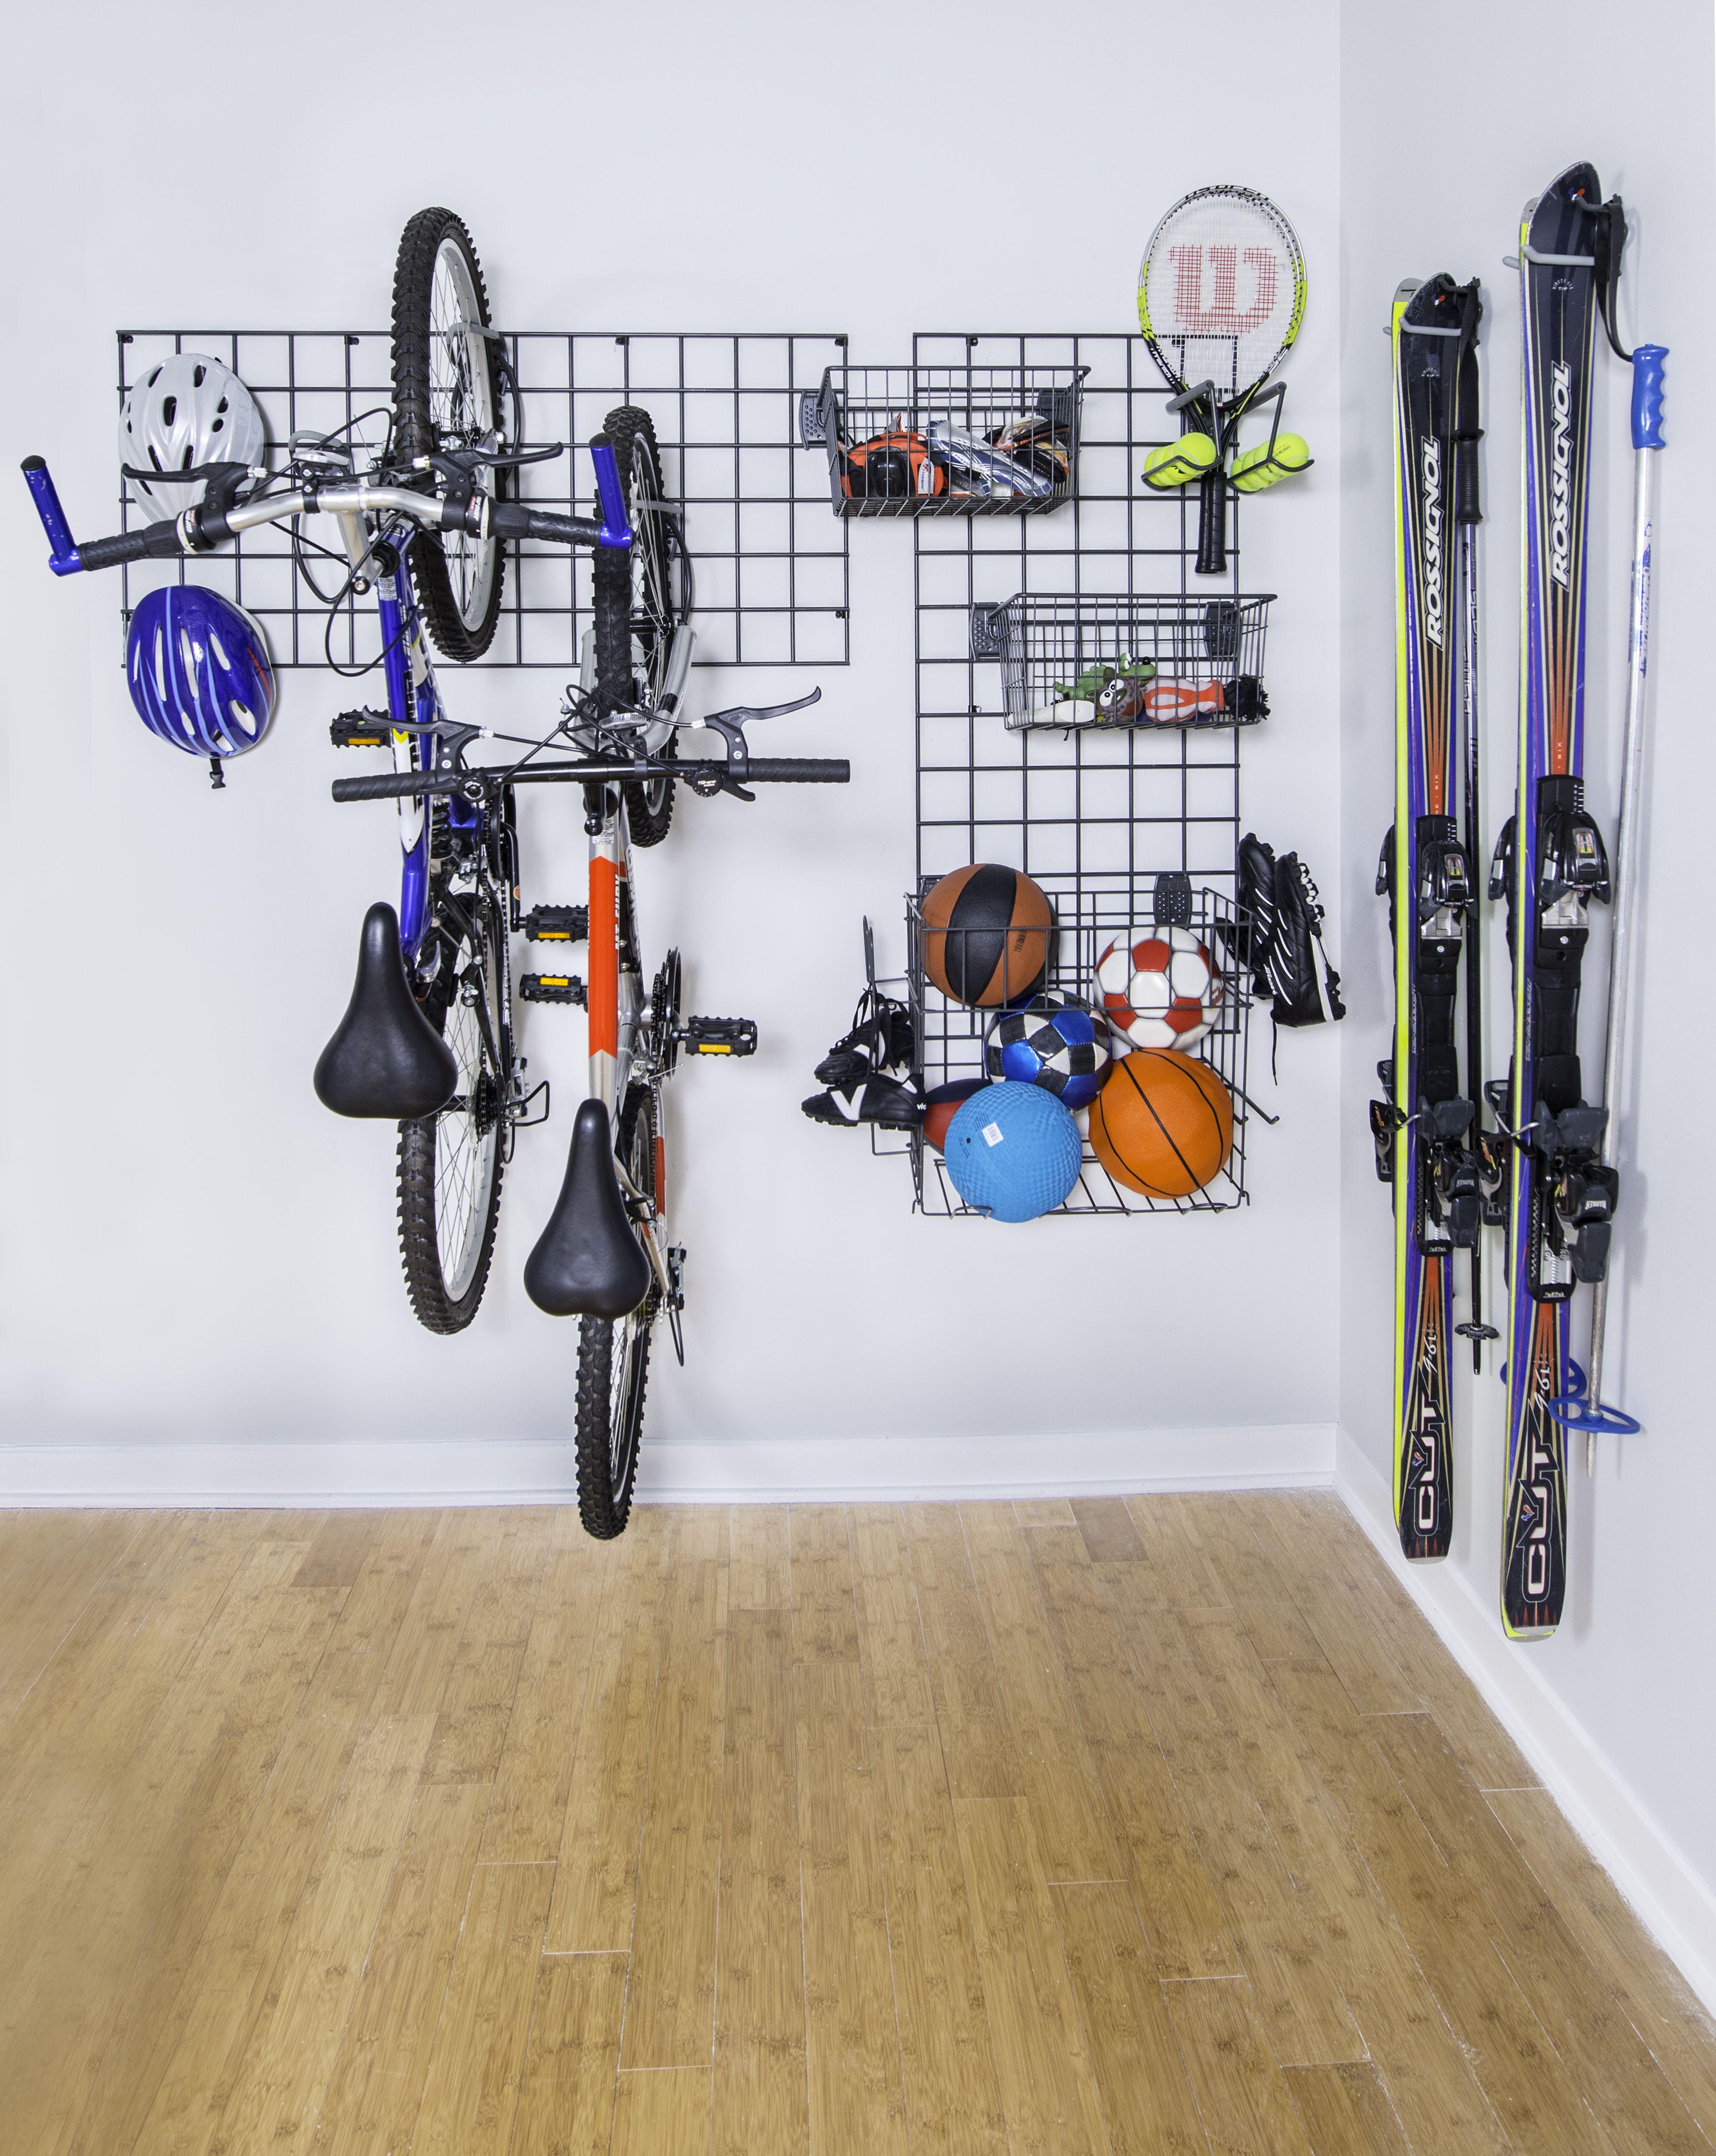 Garage Storage For Organizing Sports Equipment And Gardening Tools Kids Sports Room Sports Storage Garage Organization